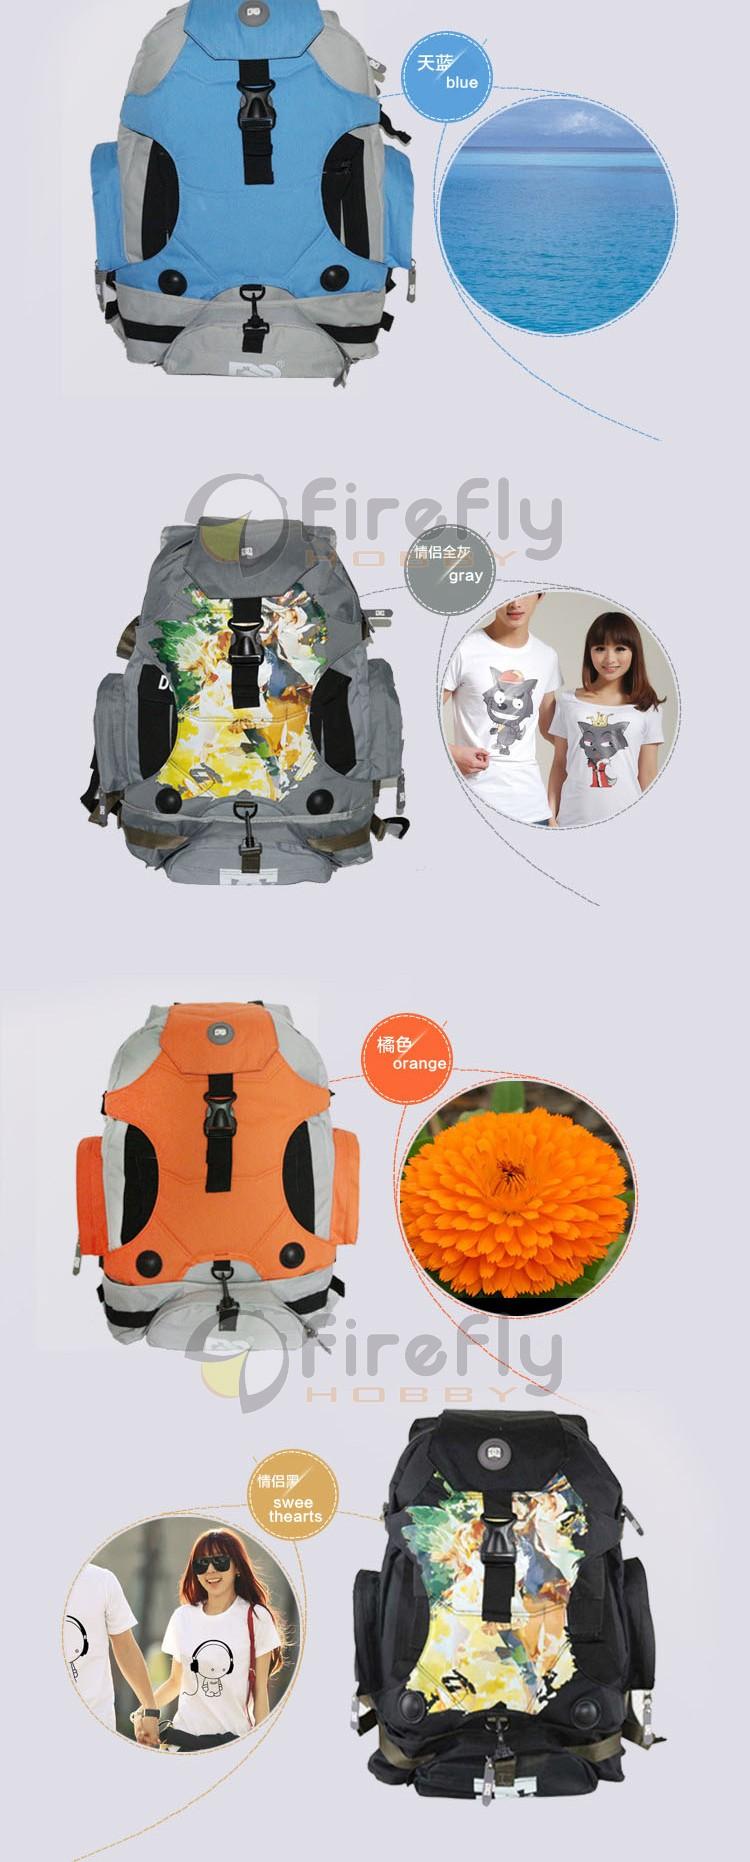 DJI Inspire 1 Accessory Waterproof Shoulder Backpack Multifunctional Backpack Carrying Bag